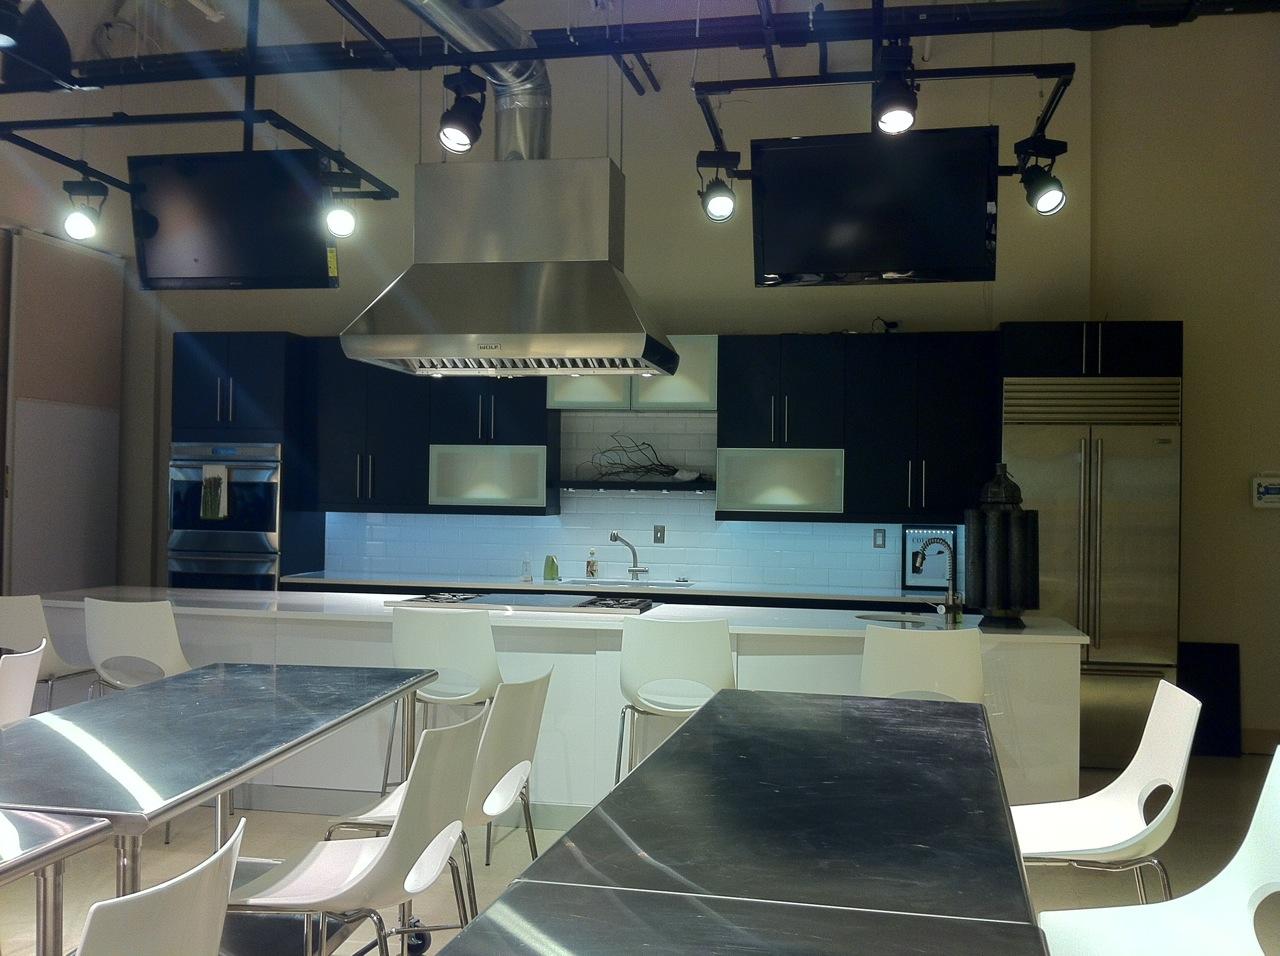 Kitchen Demo Facility at Enterprise Center